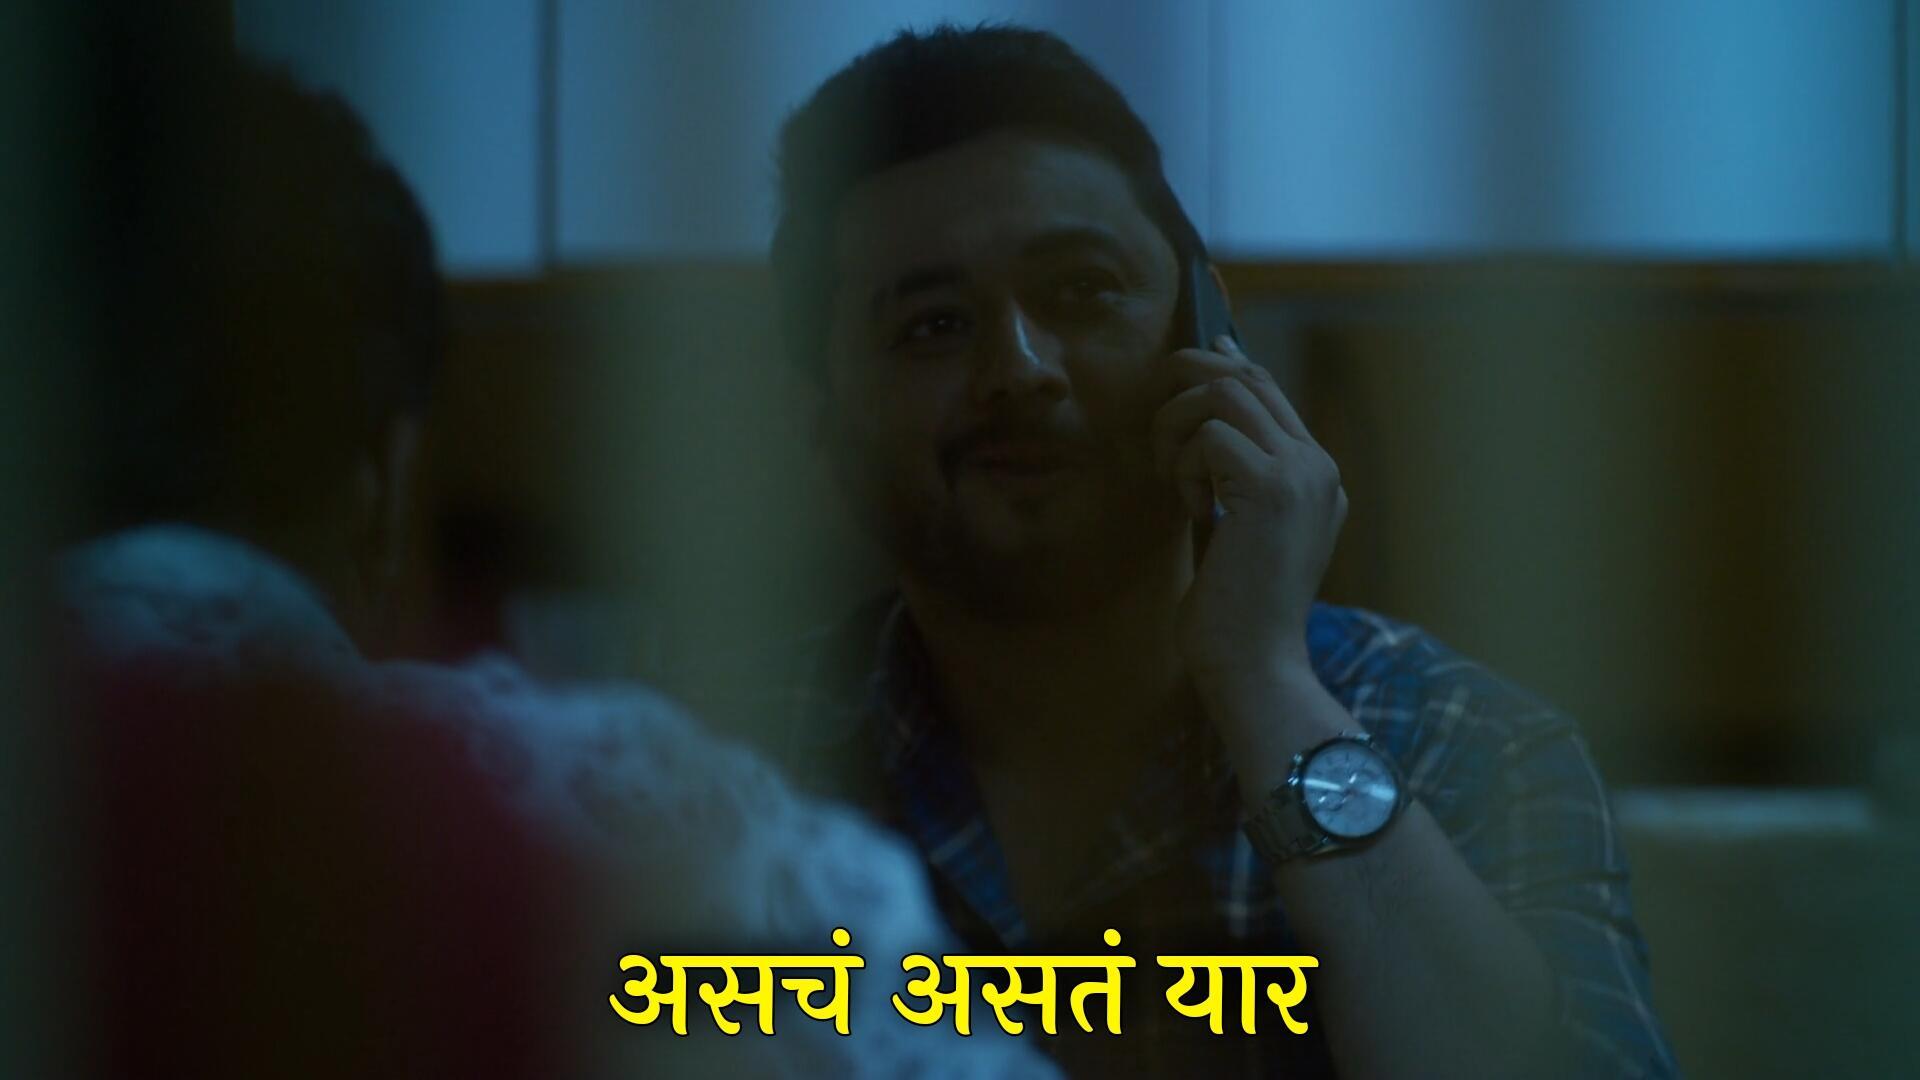 Swapnil Joshi Samantar Season 2